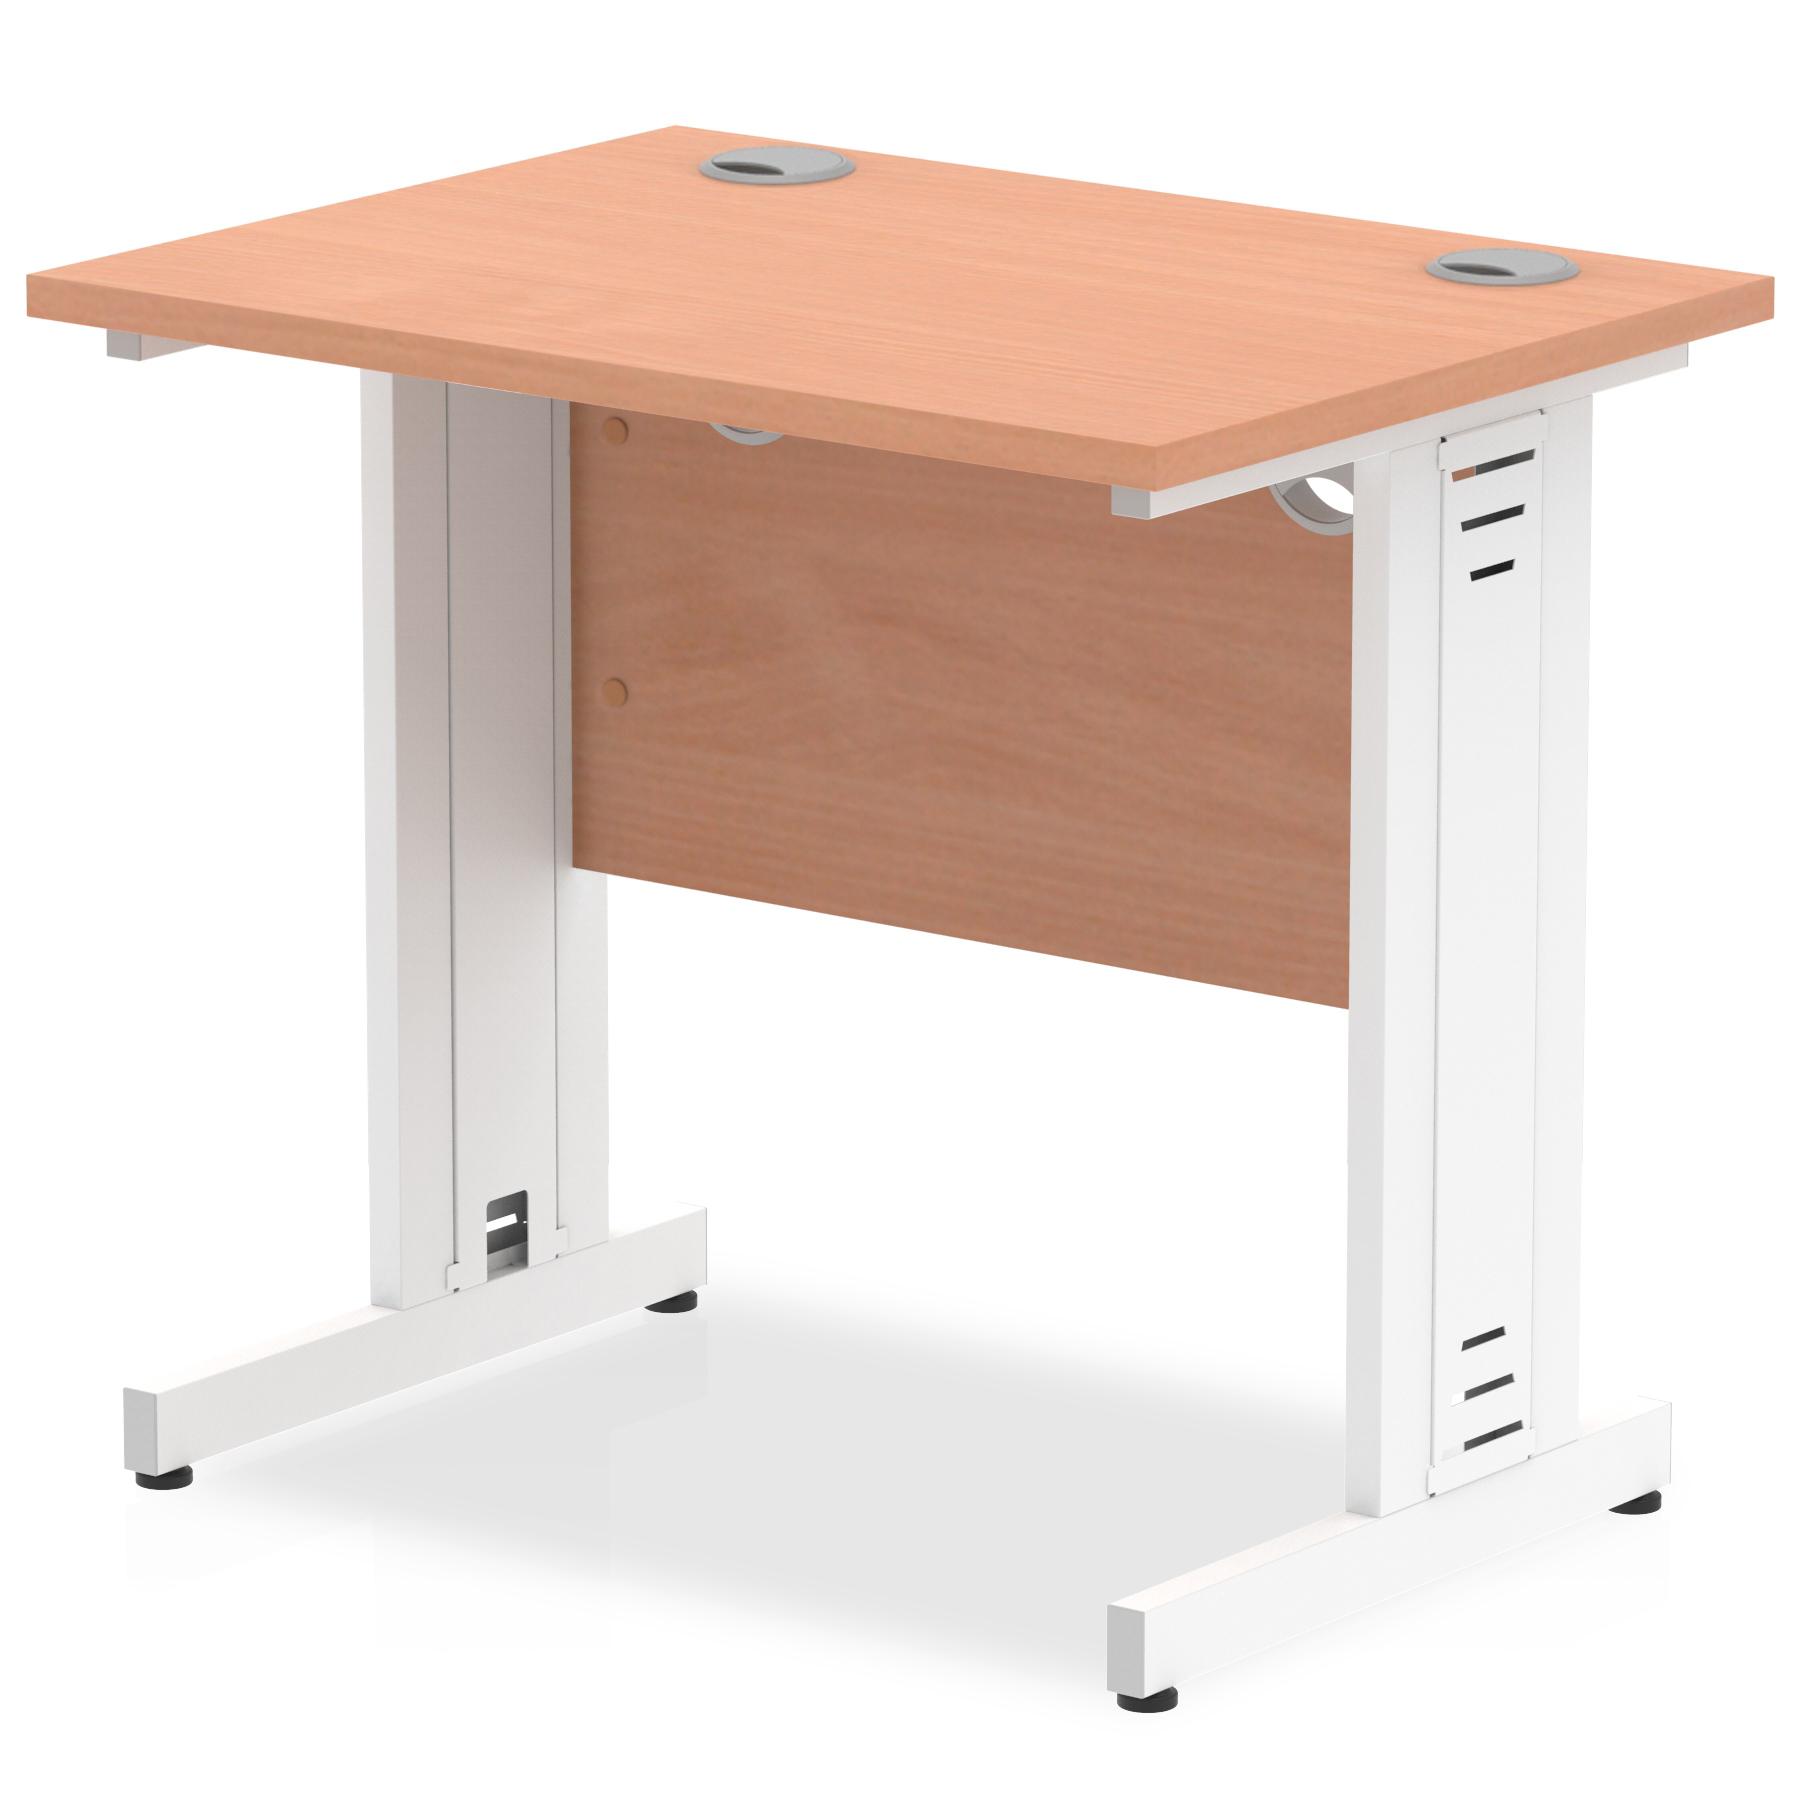 Trexus Desk Rectangle Cable Managed White Leg 800x600mm Beech Ref MI002888